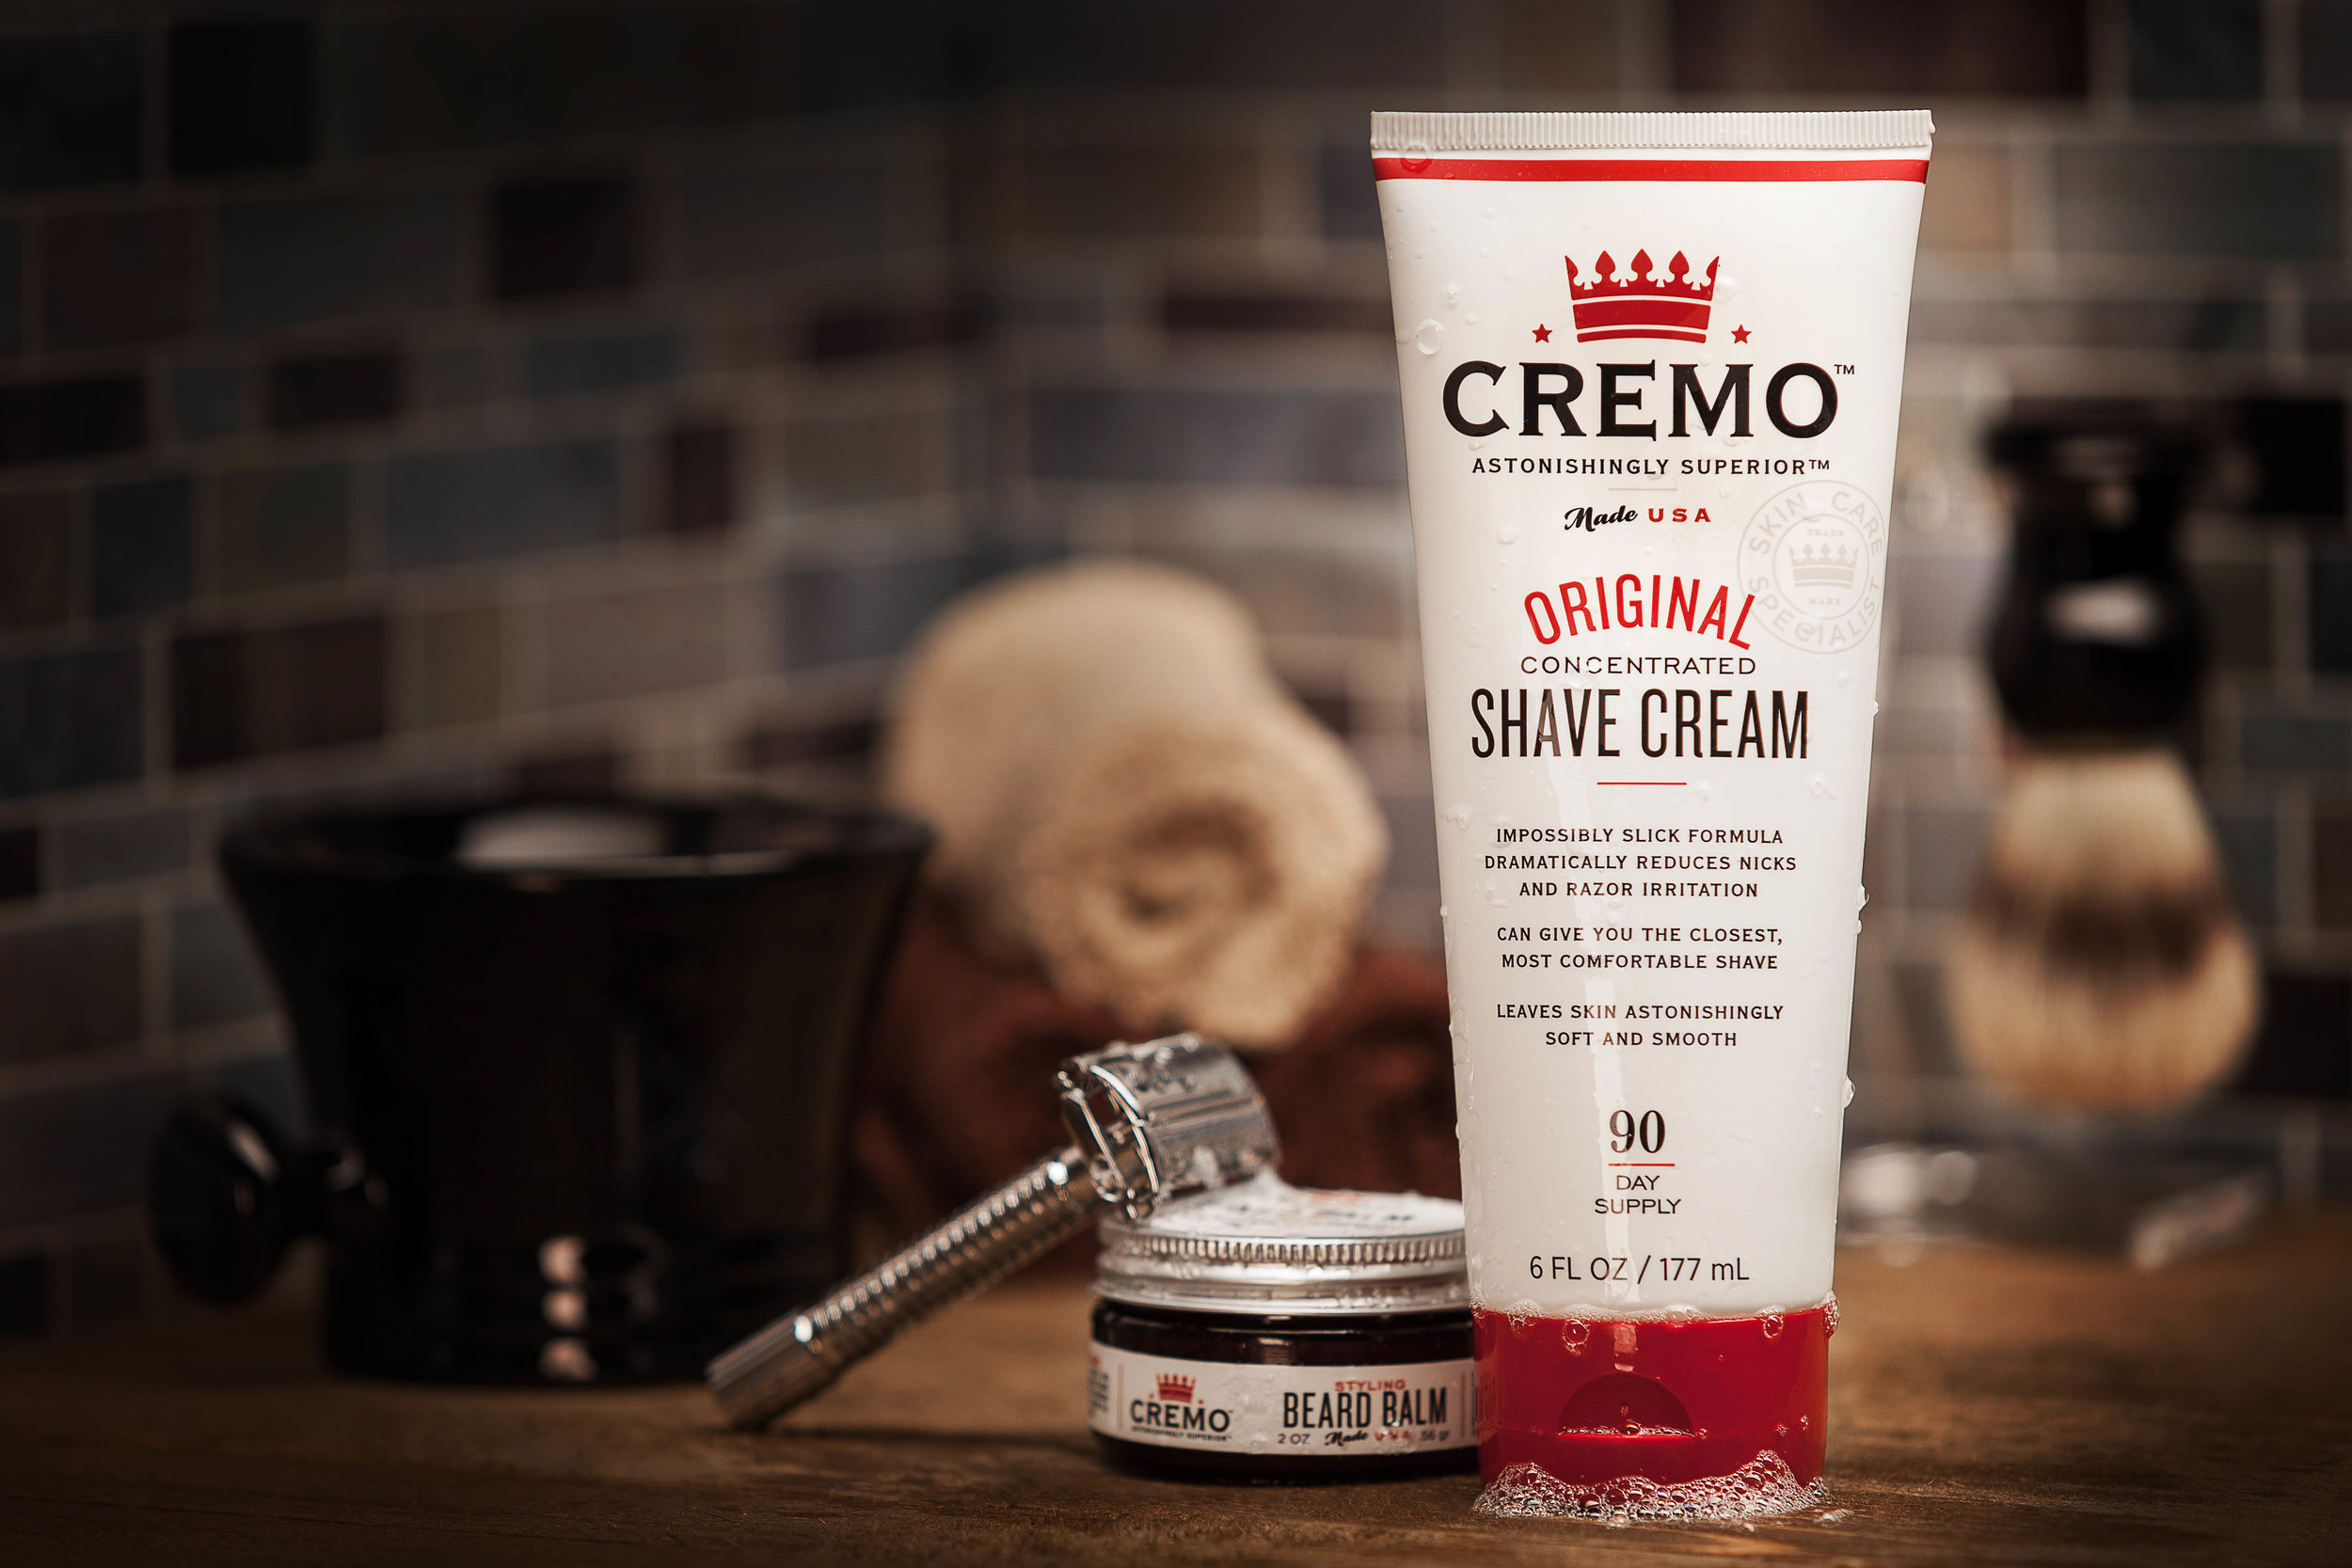 AD_11_Cremo Shave Cream Product Shot_2153.jpg